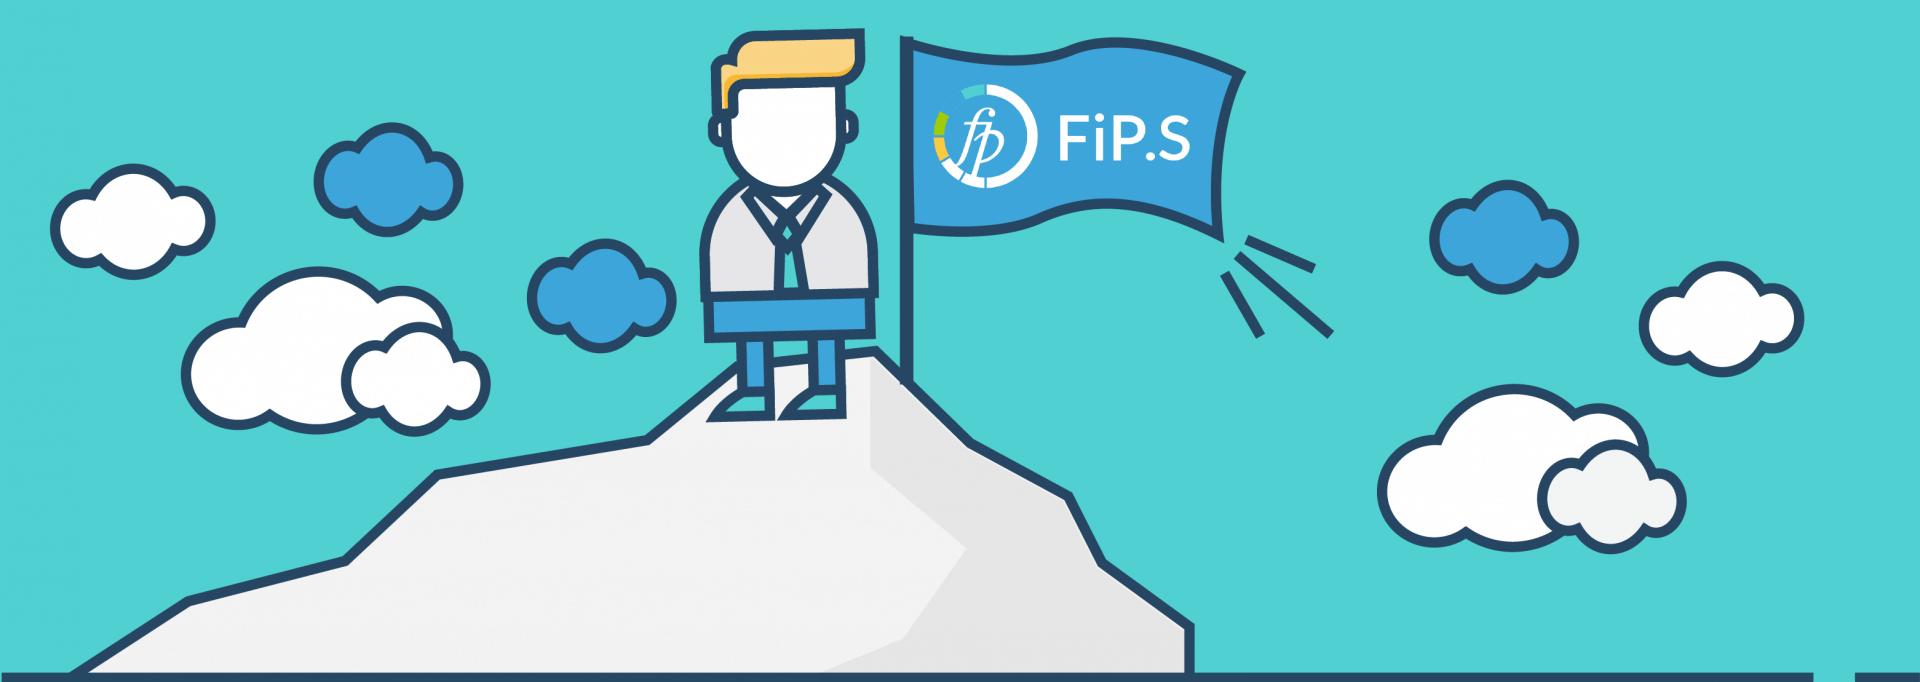 FiP.S Core Values: Harte Arbeit hoher Standard